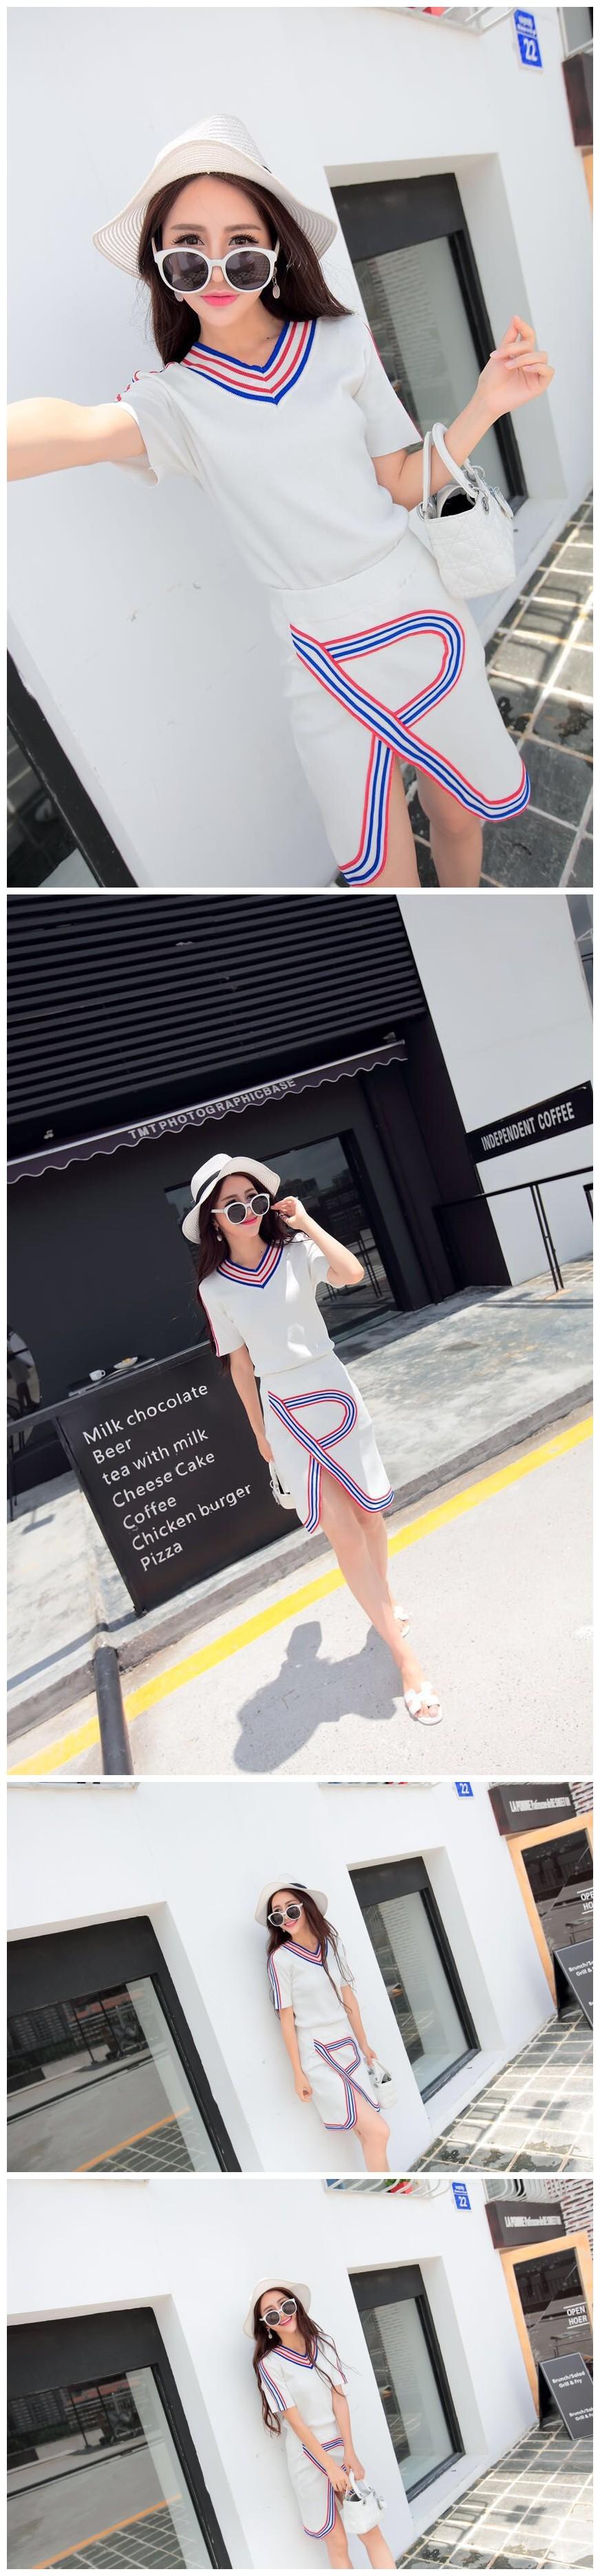 2 Piece Knit Skirt Set New 2016 Women Leisure Hit Color V-Neck Short Sleeve Sweater Top + Split Striped Slim Pencil Skirt Suit